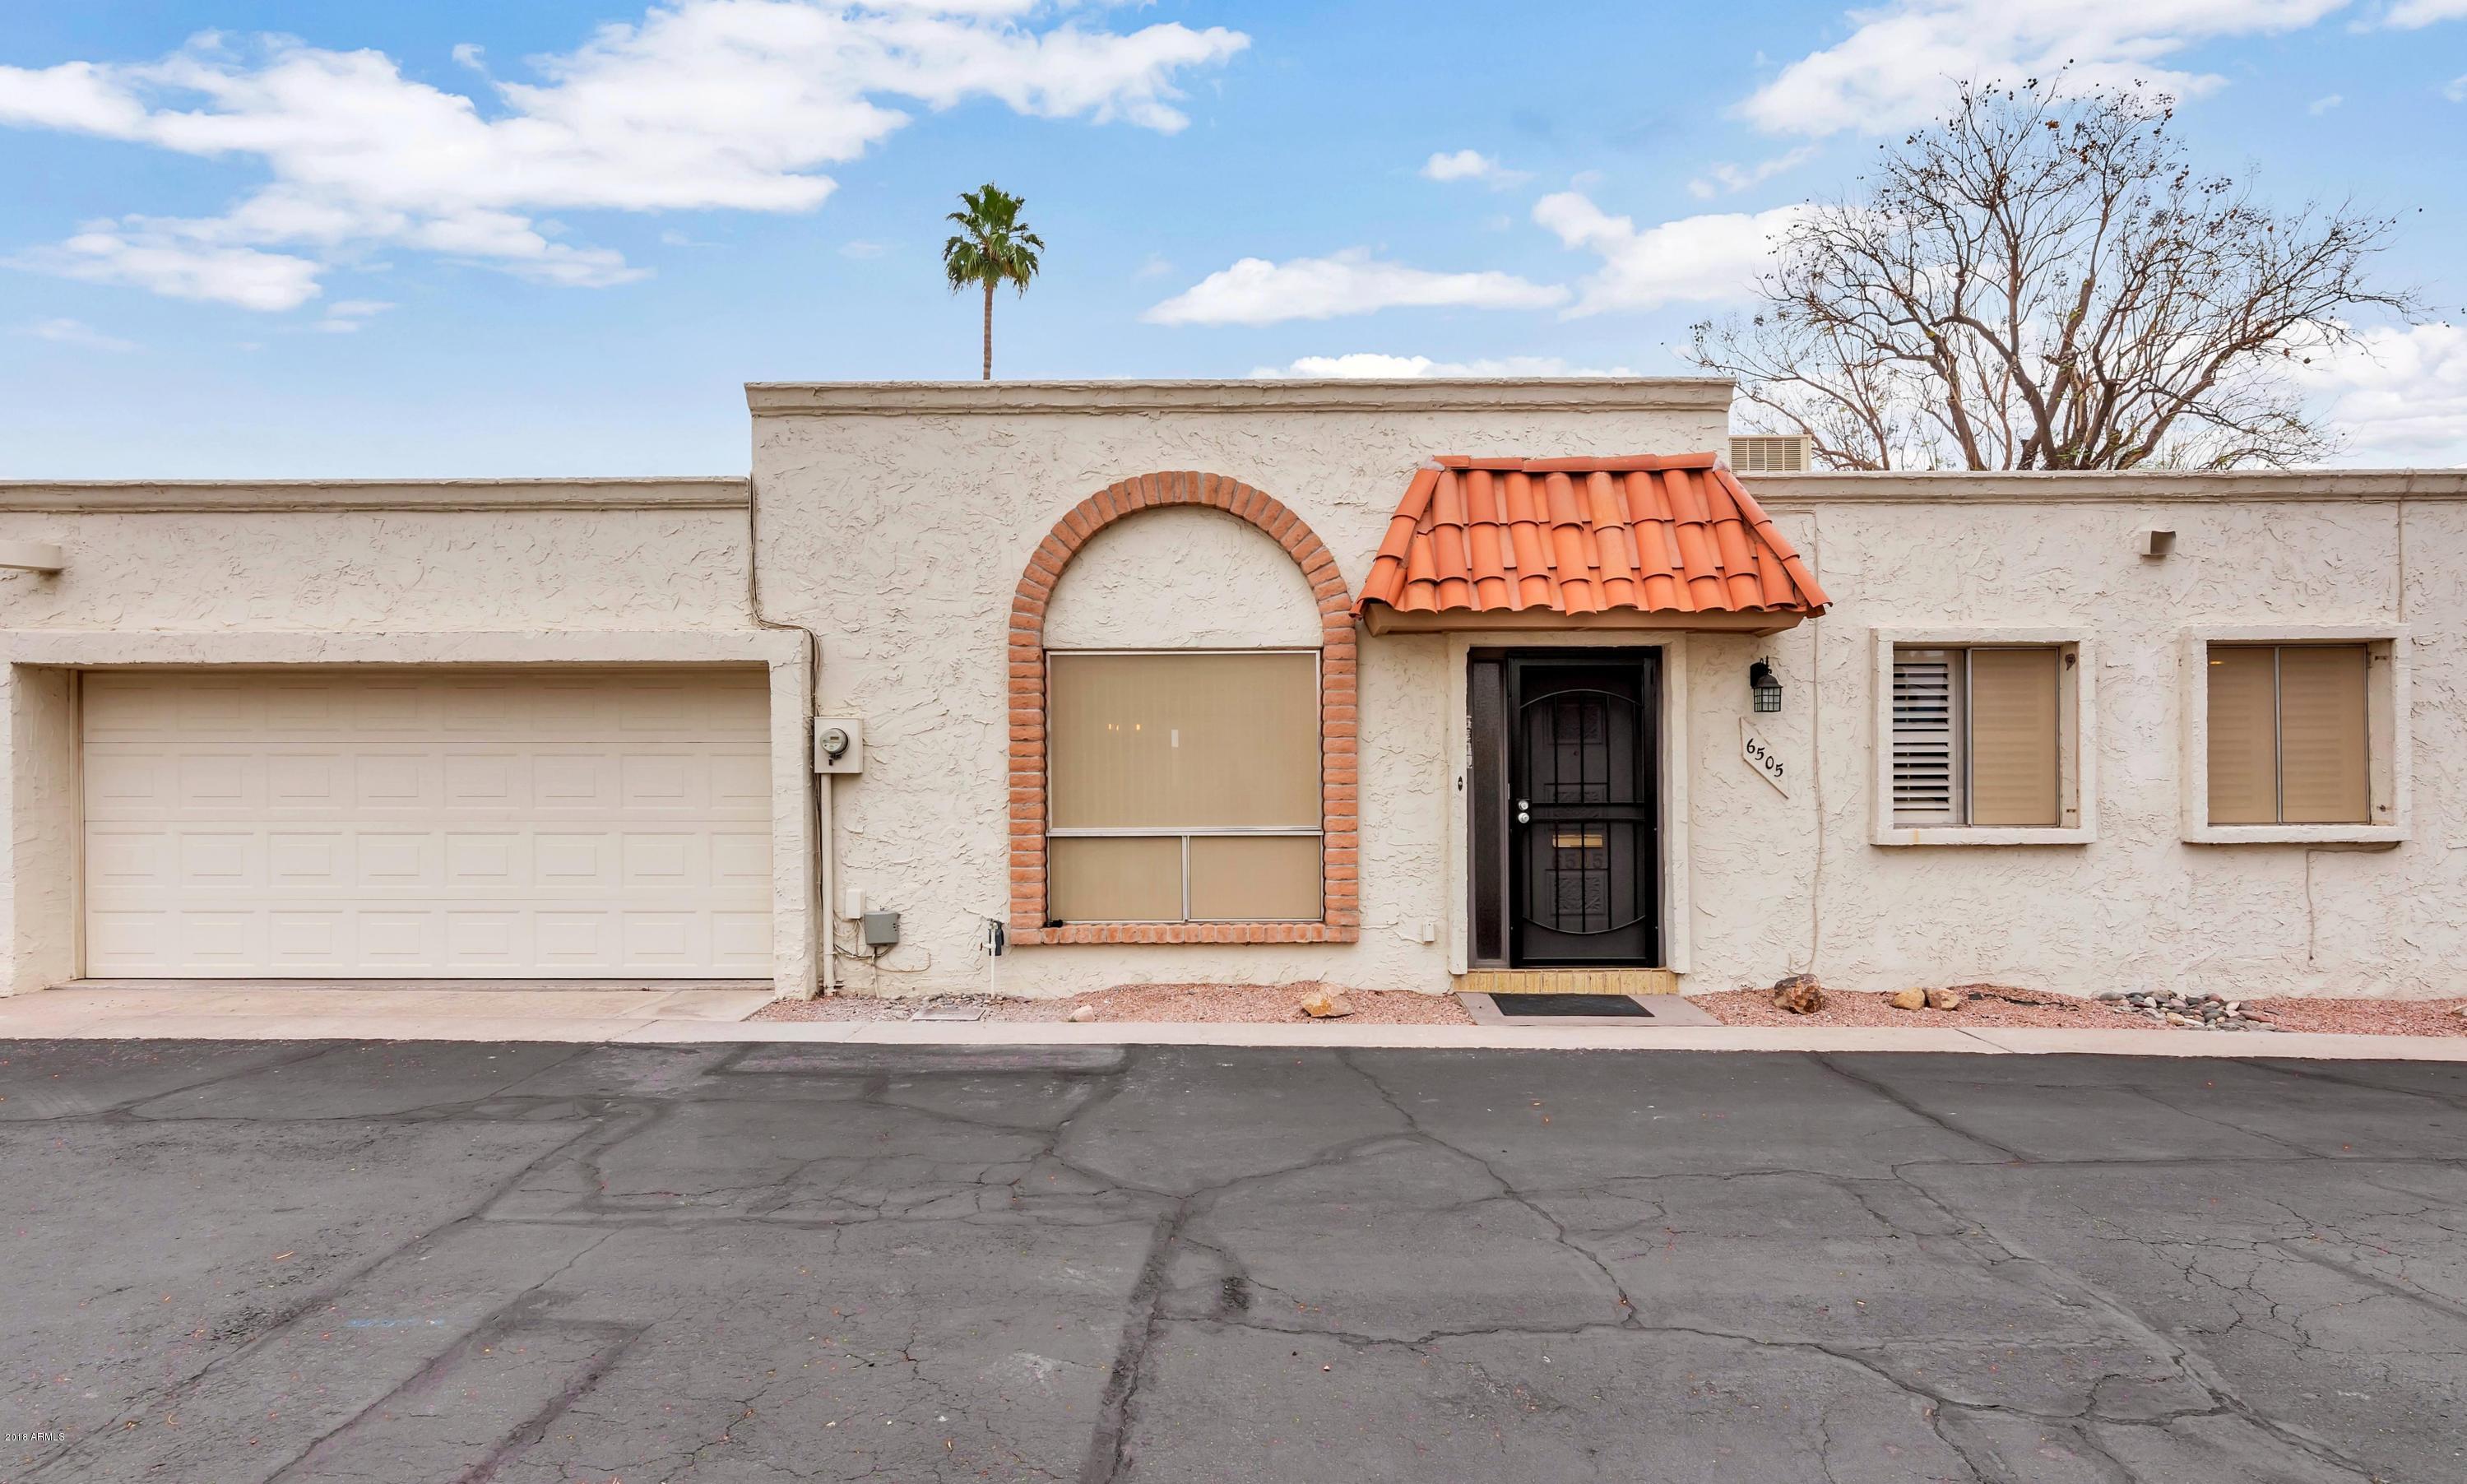 Photo of 6505 N 12TH Place, Phoenix, AZ 85014